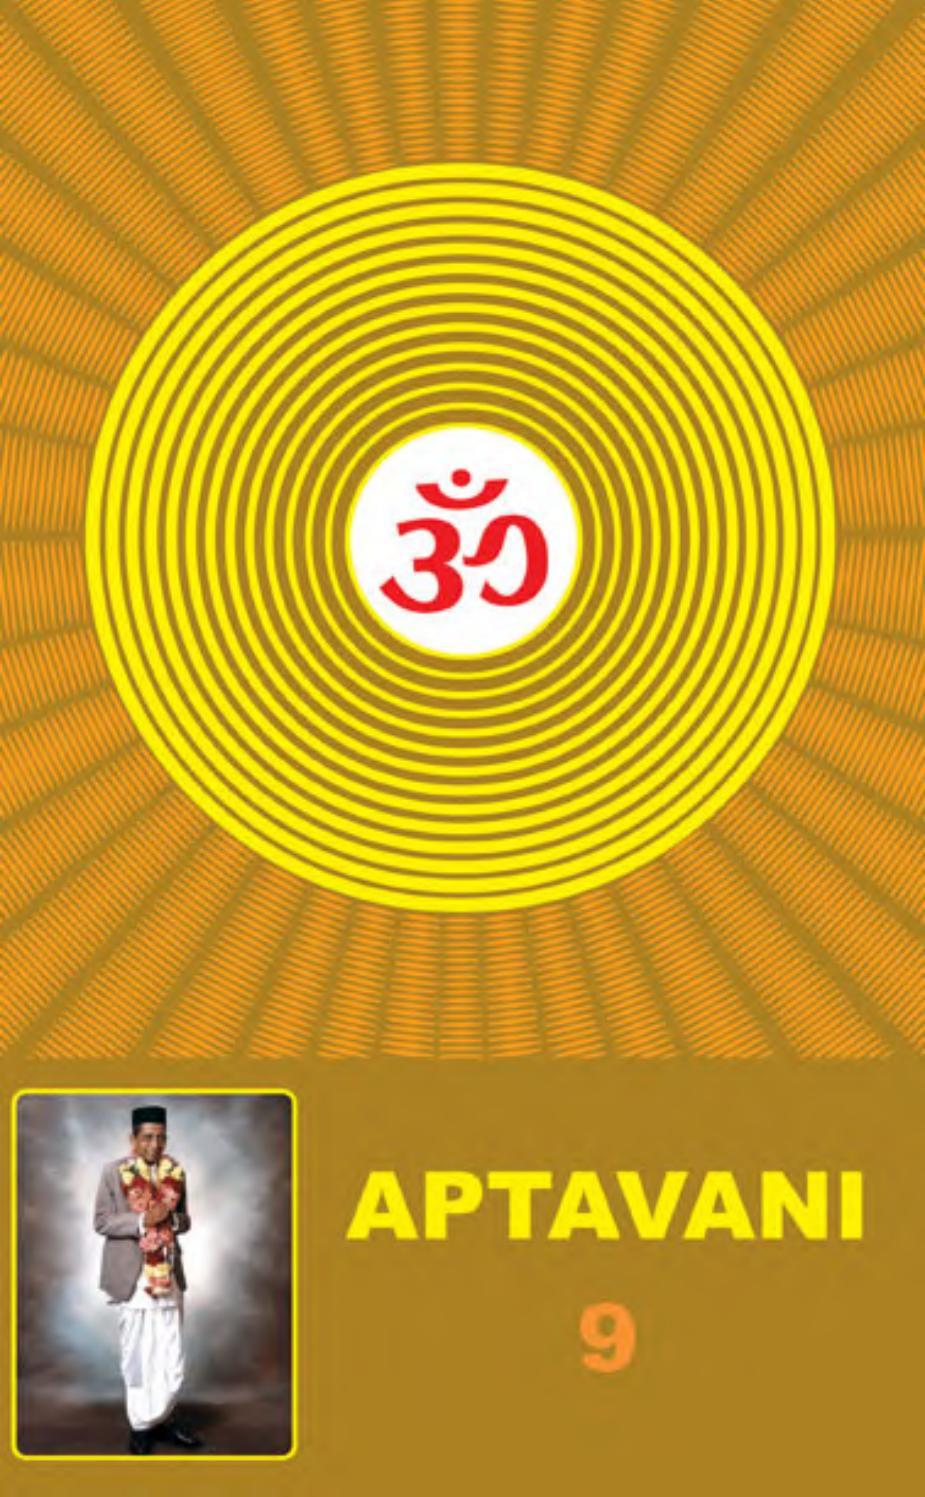 Aptavani-9 Part 1 by Dada Bhagwan - issuu